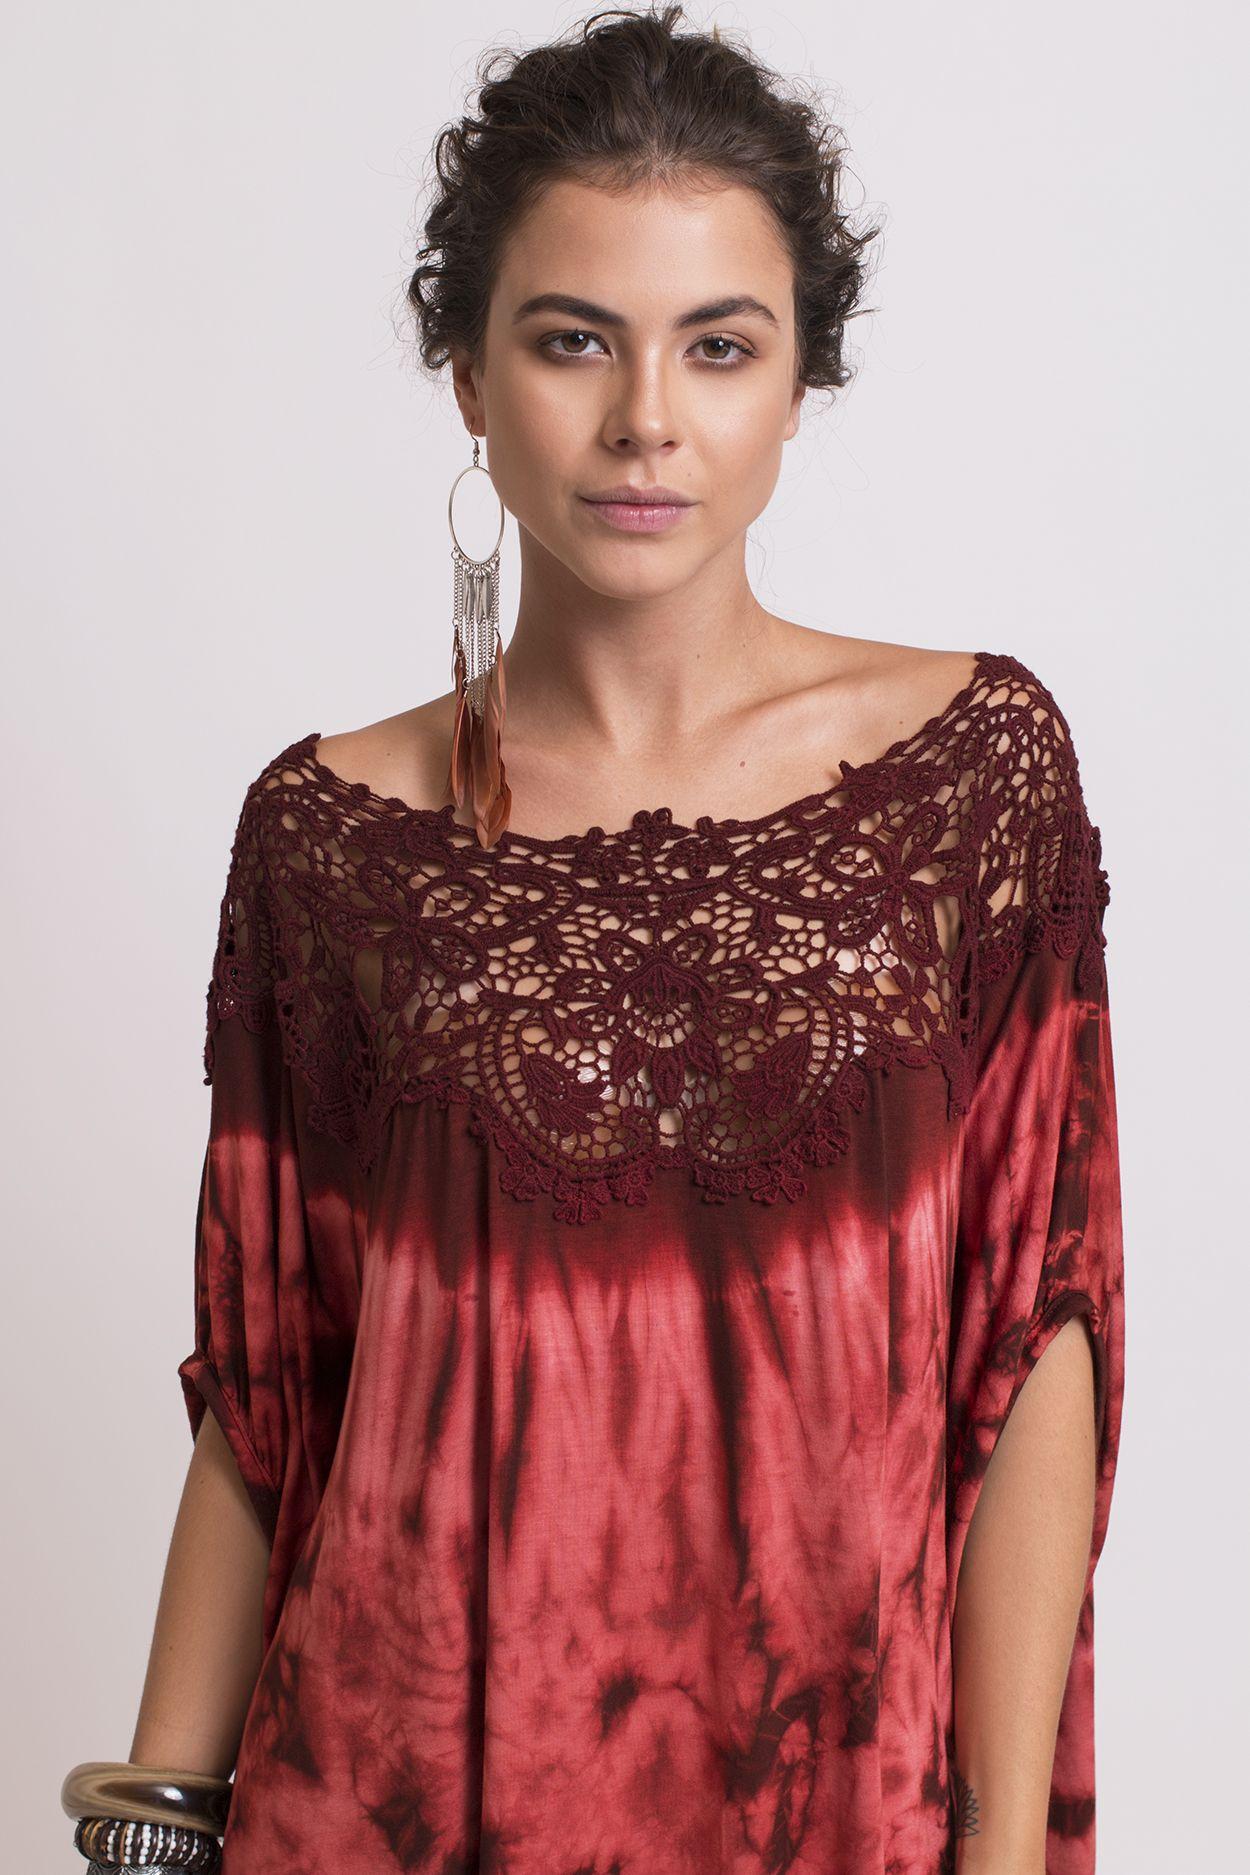 blusa tie-dye renda guipir boho moda feminina kamui